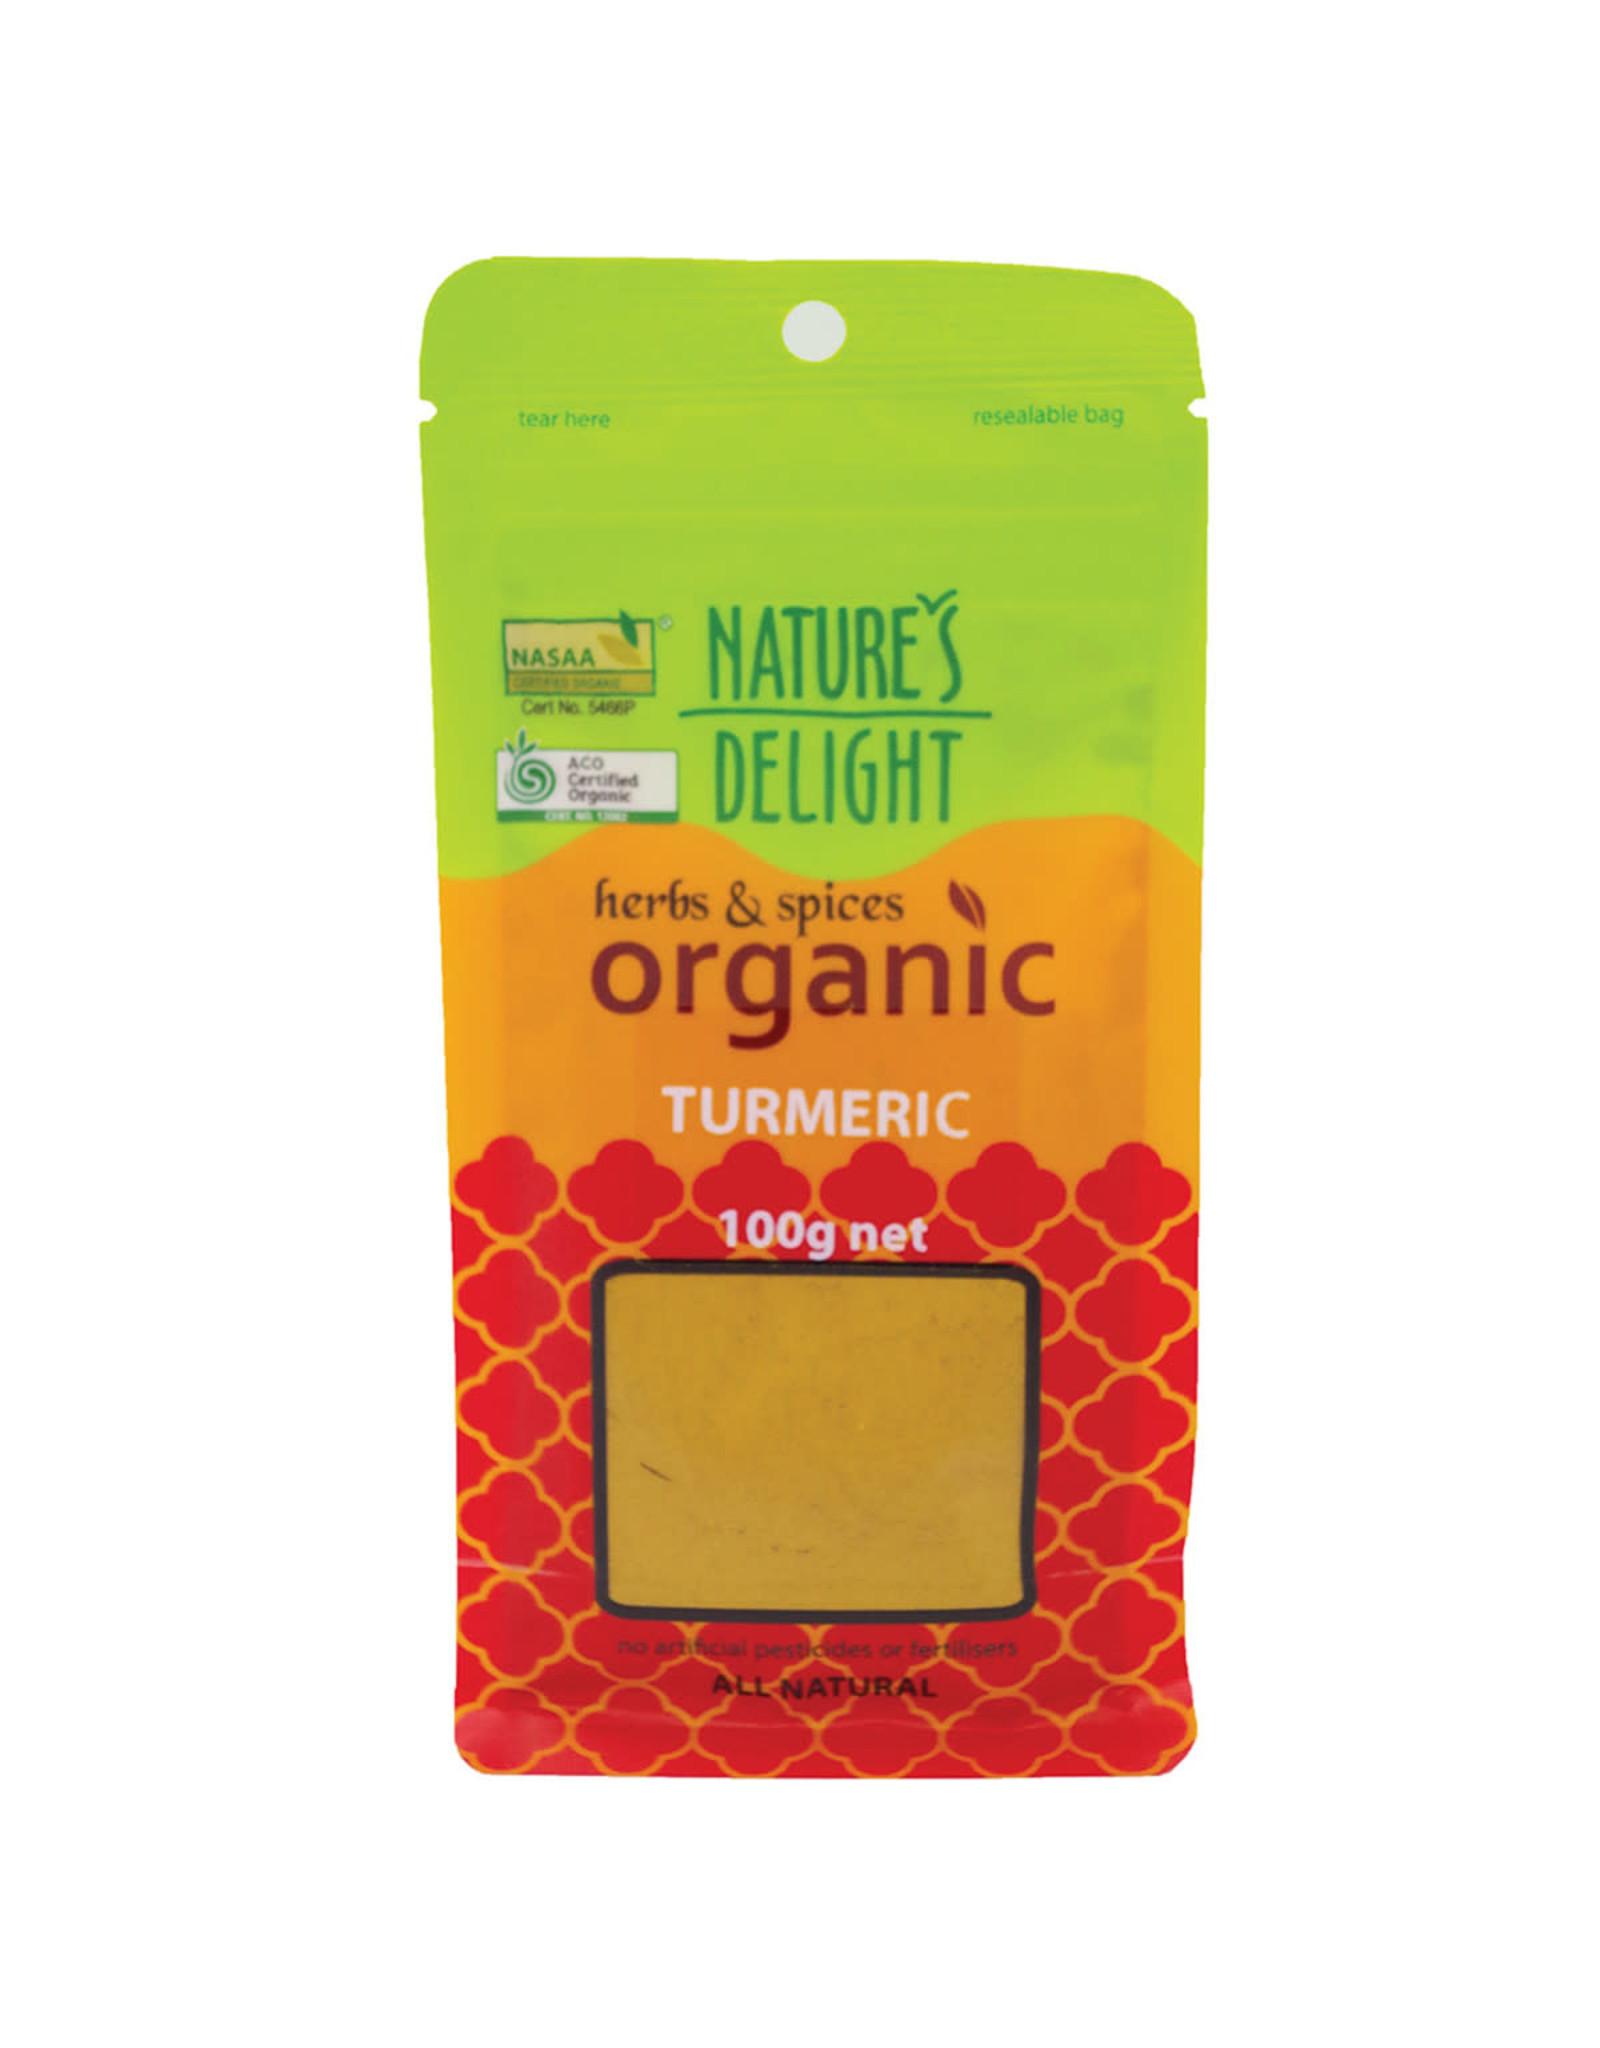 Nature's Delight Organic Turmeric Powder 100g